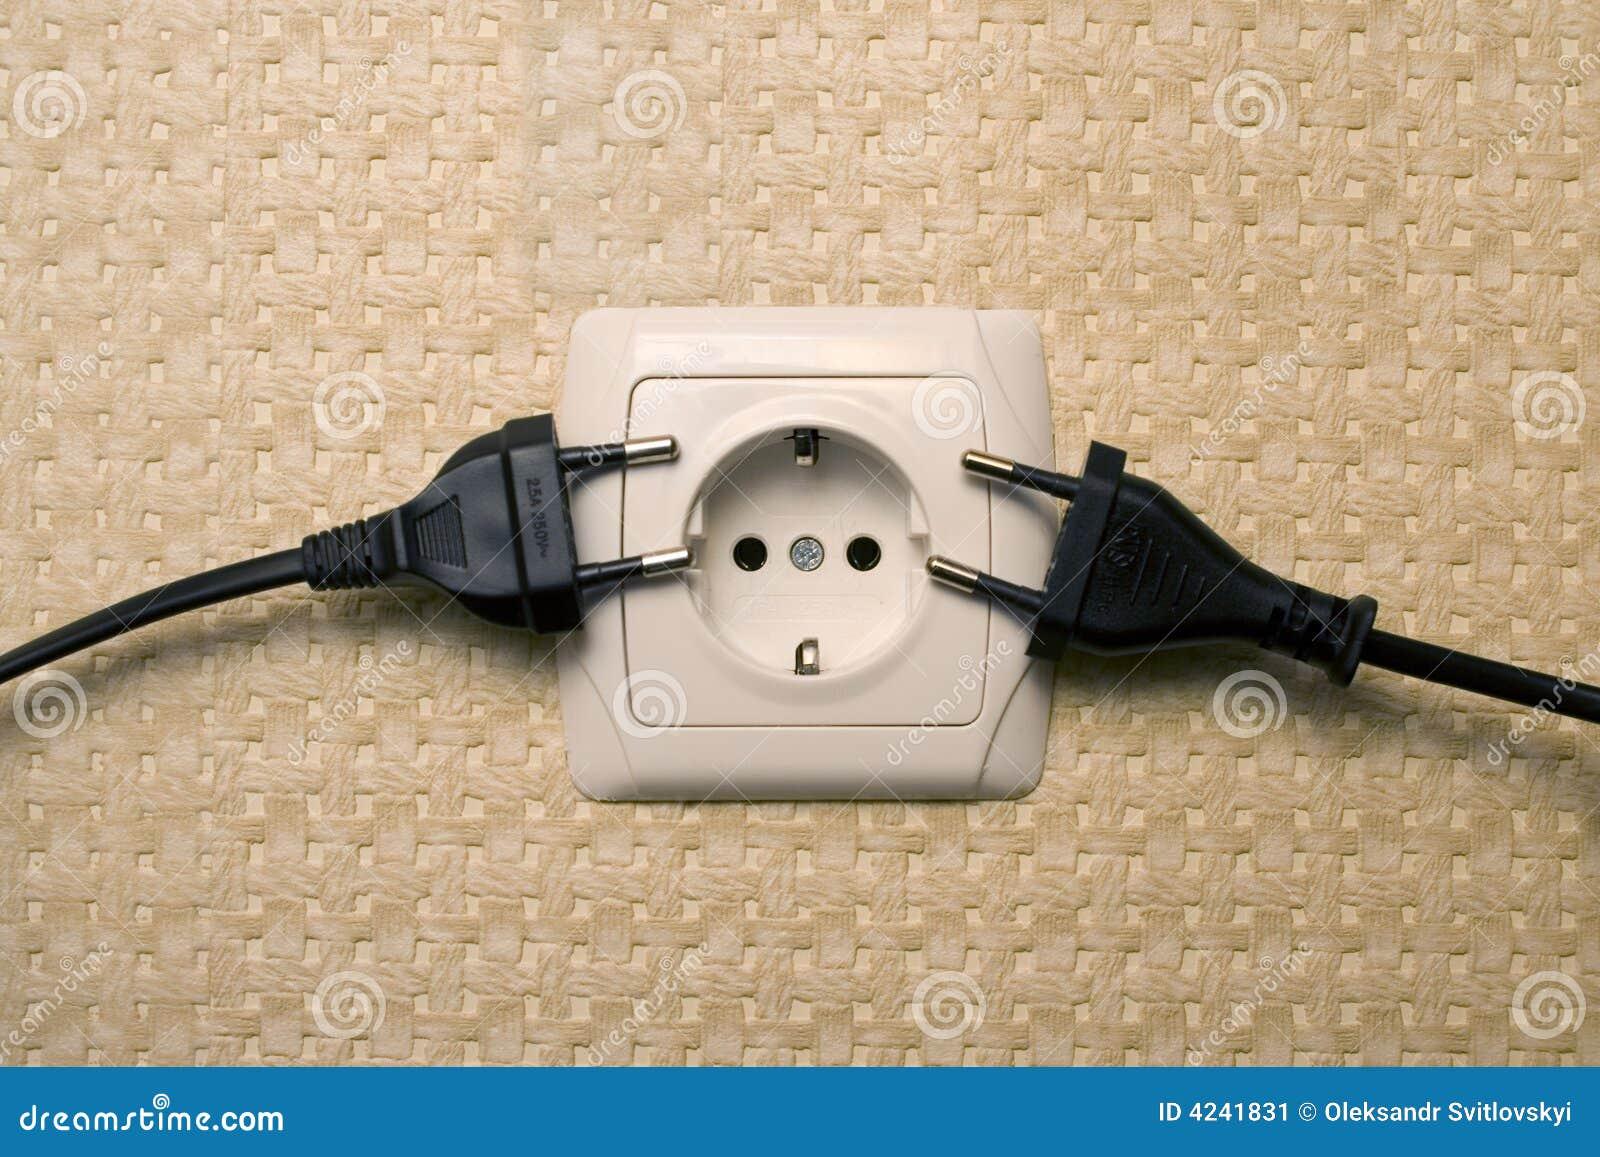 European Power Outlet